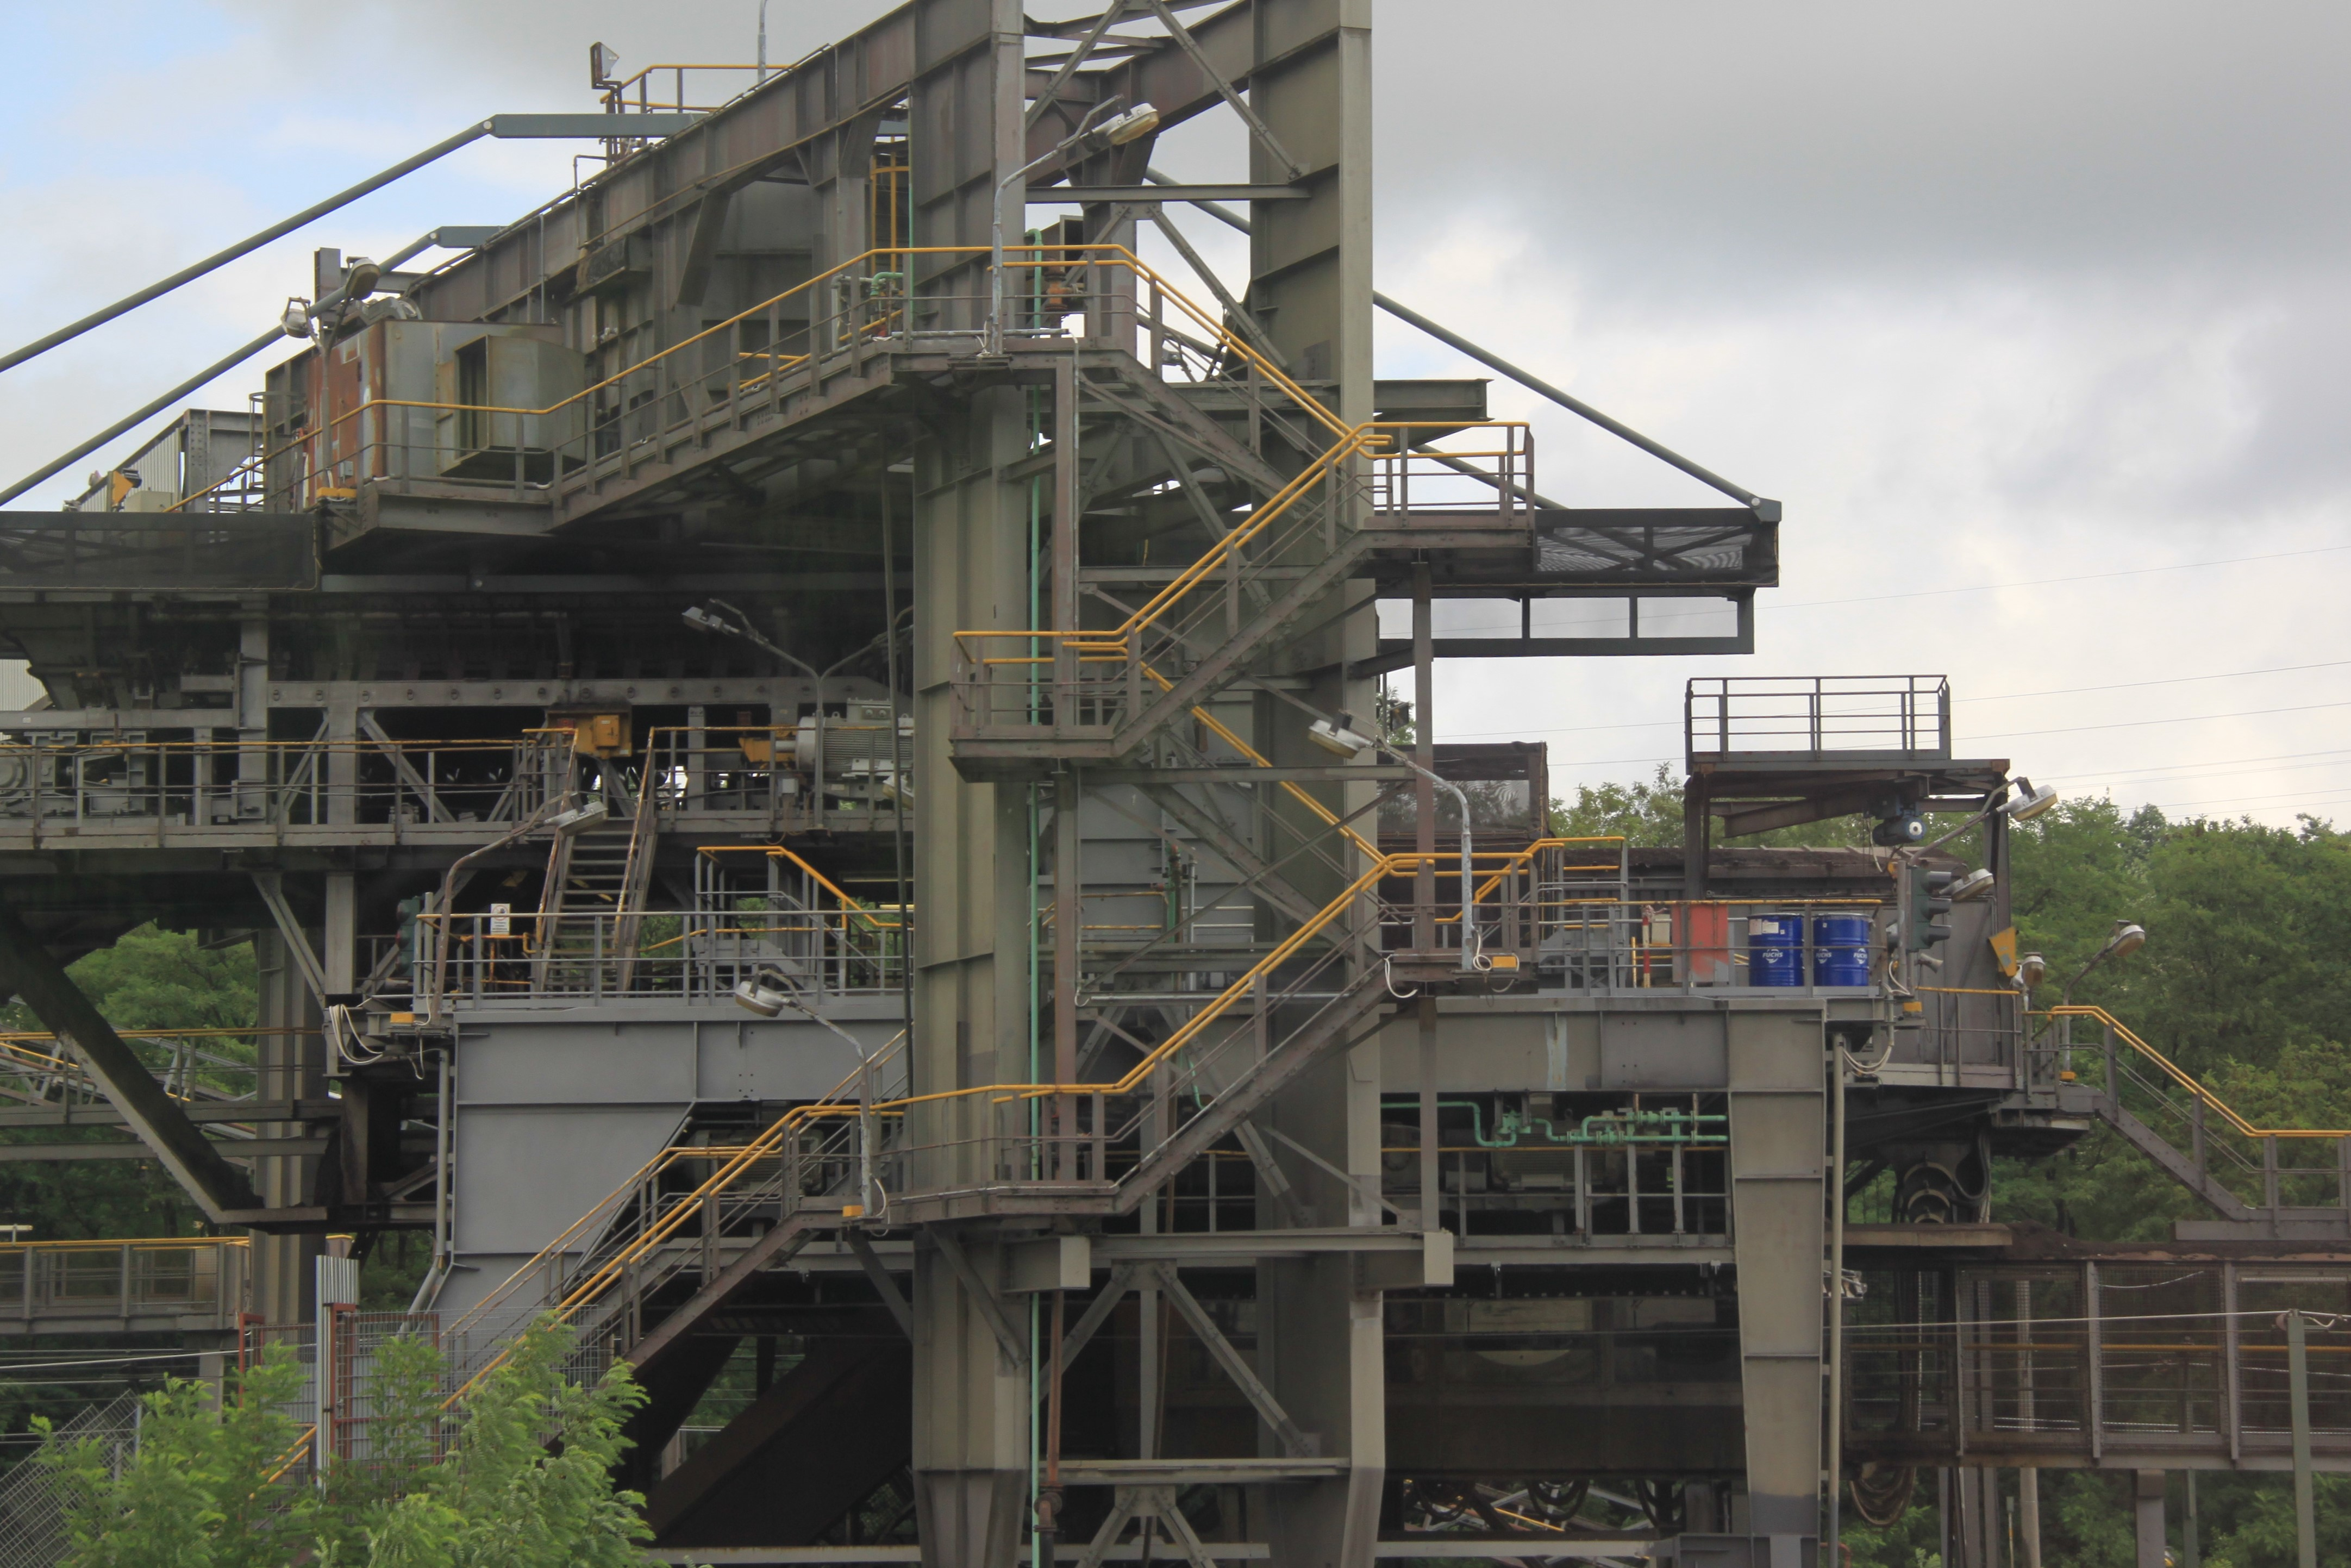 2017-06-25 - 07 - HCC bezoekt Bruinkoolafgraving Garzweiler